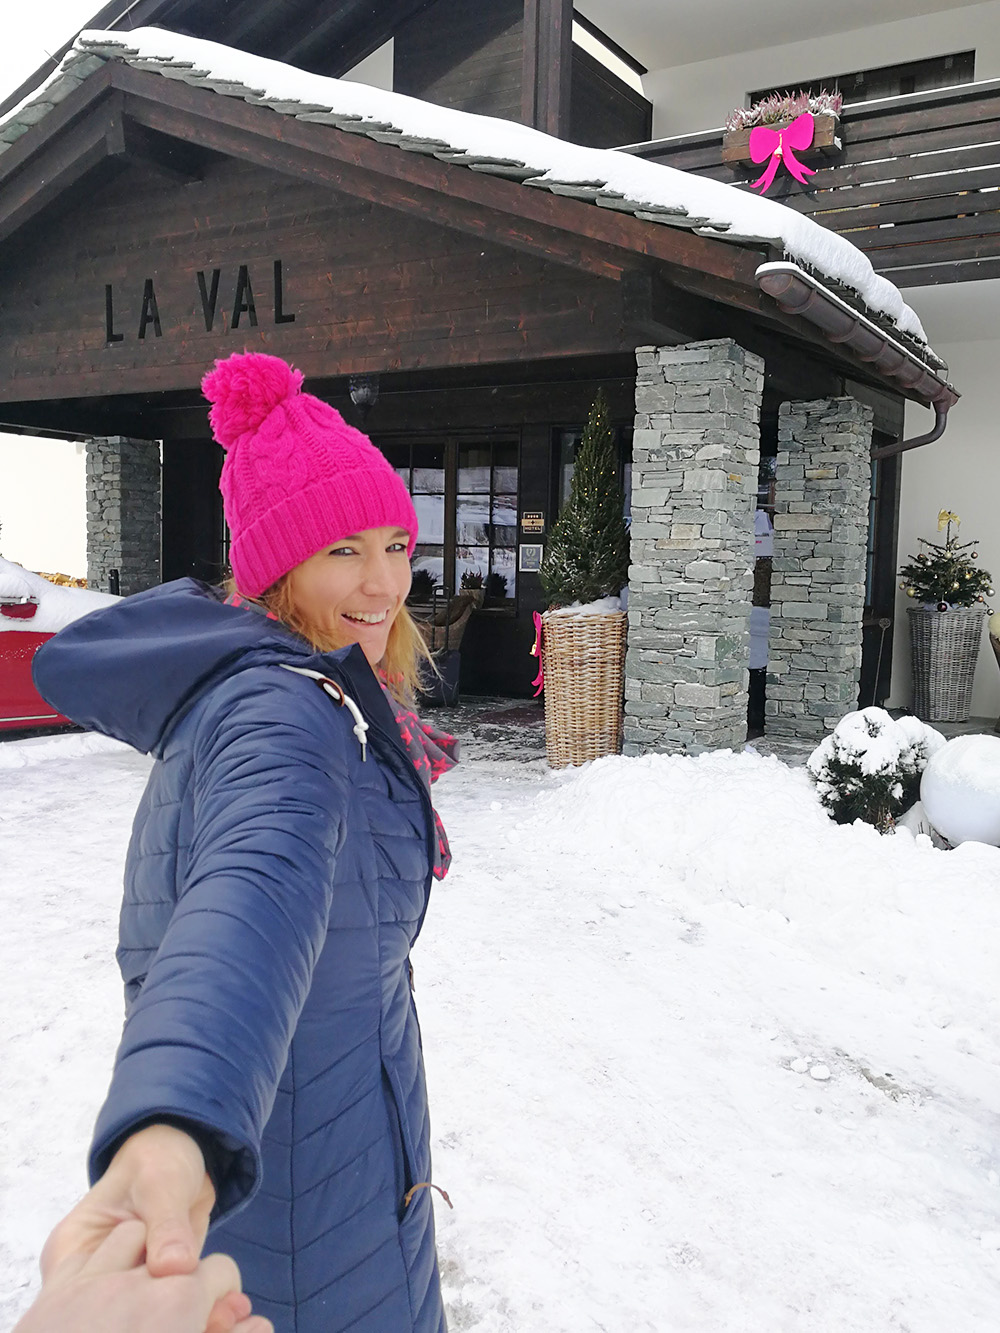 Bergspa Hotel LA VAL Hoteltipp für Brigels Travel Sisi vor dem Eingang